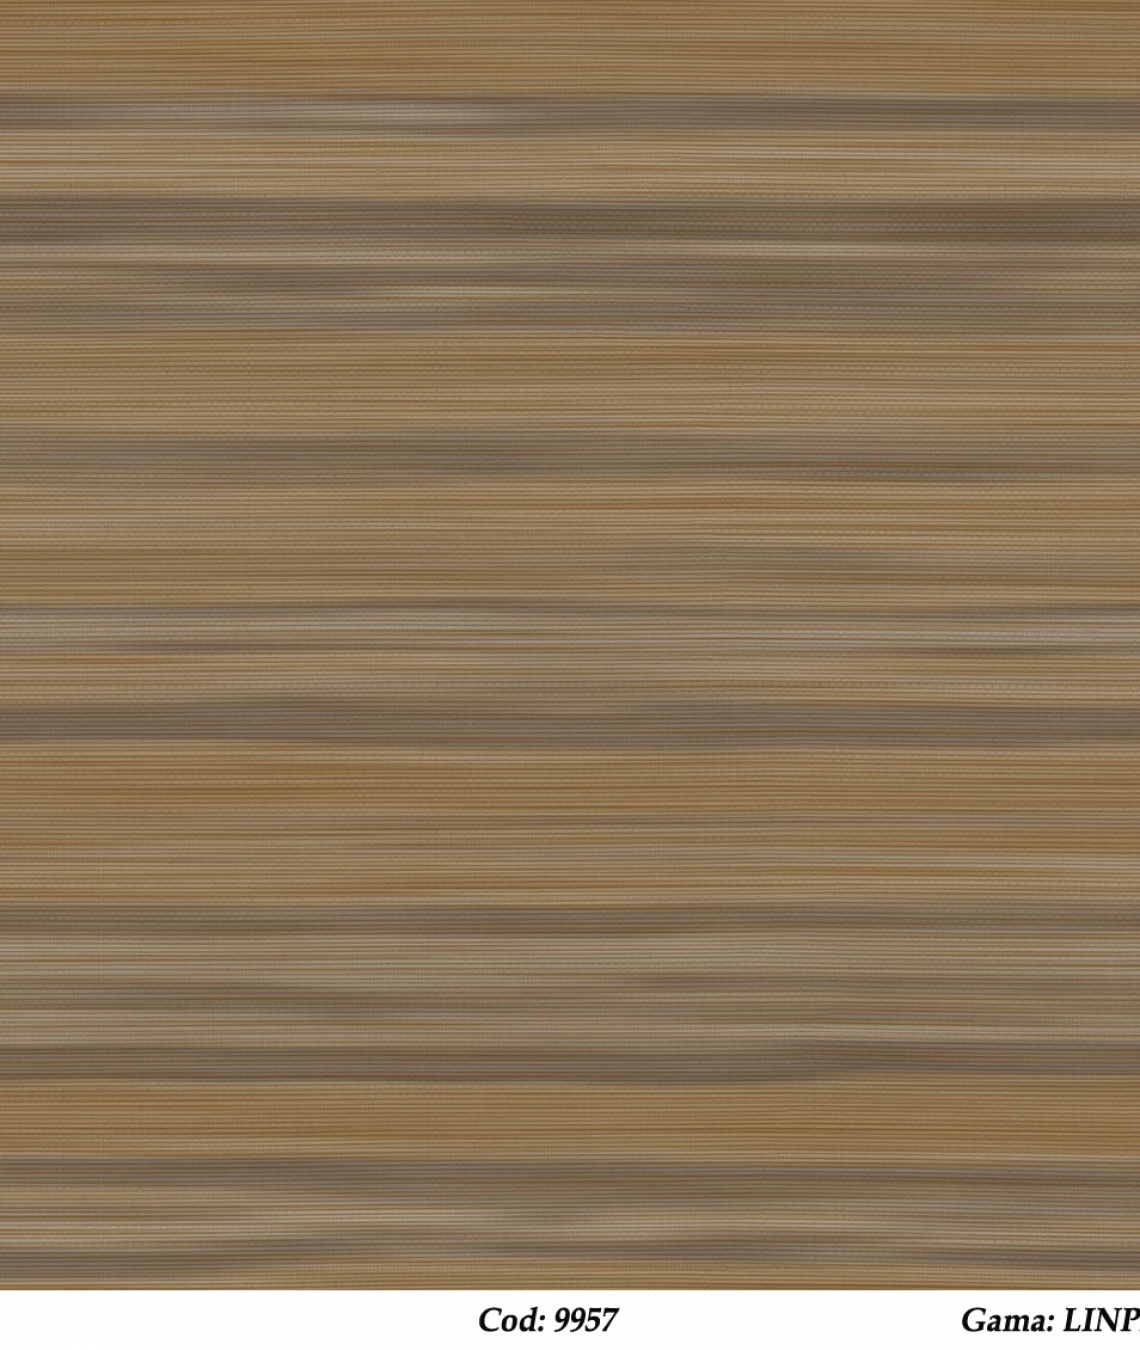 tapet-cu-dungi-orizontale-cod-9957-gama-linpha